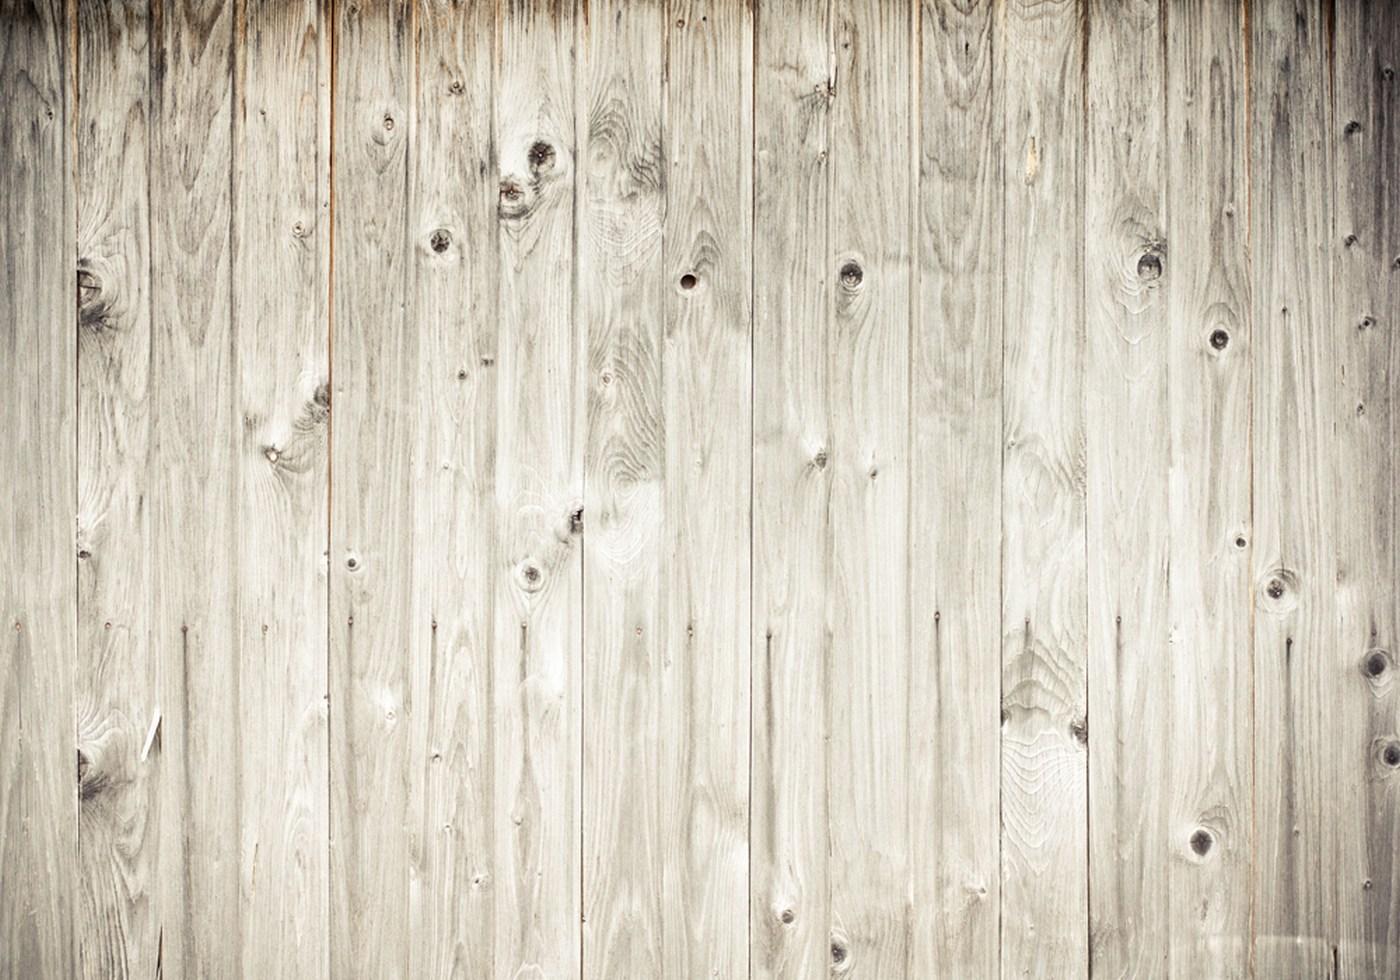 Vlies Fototapete 91   Weathered Wood Plank Holz Tapete Holzoptik Holzwand  Holzpaneel Wei